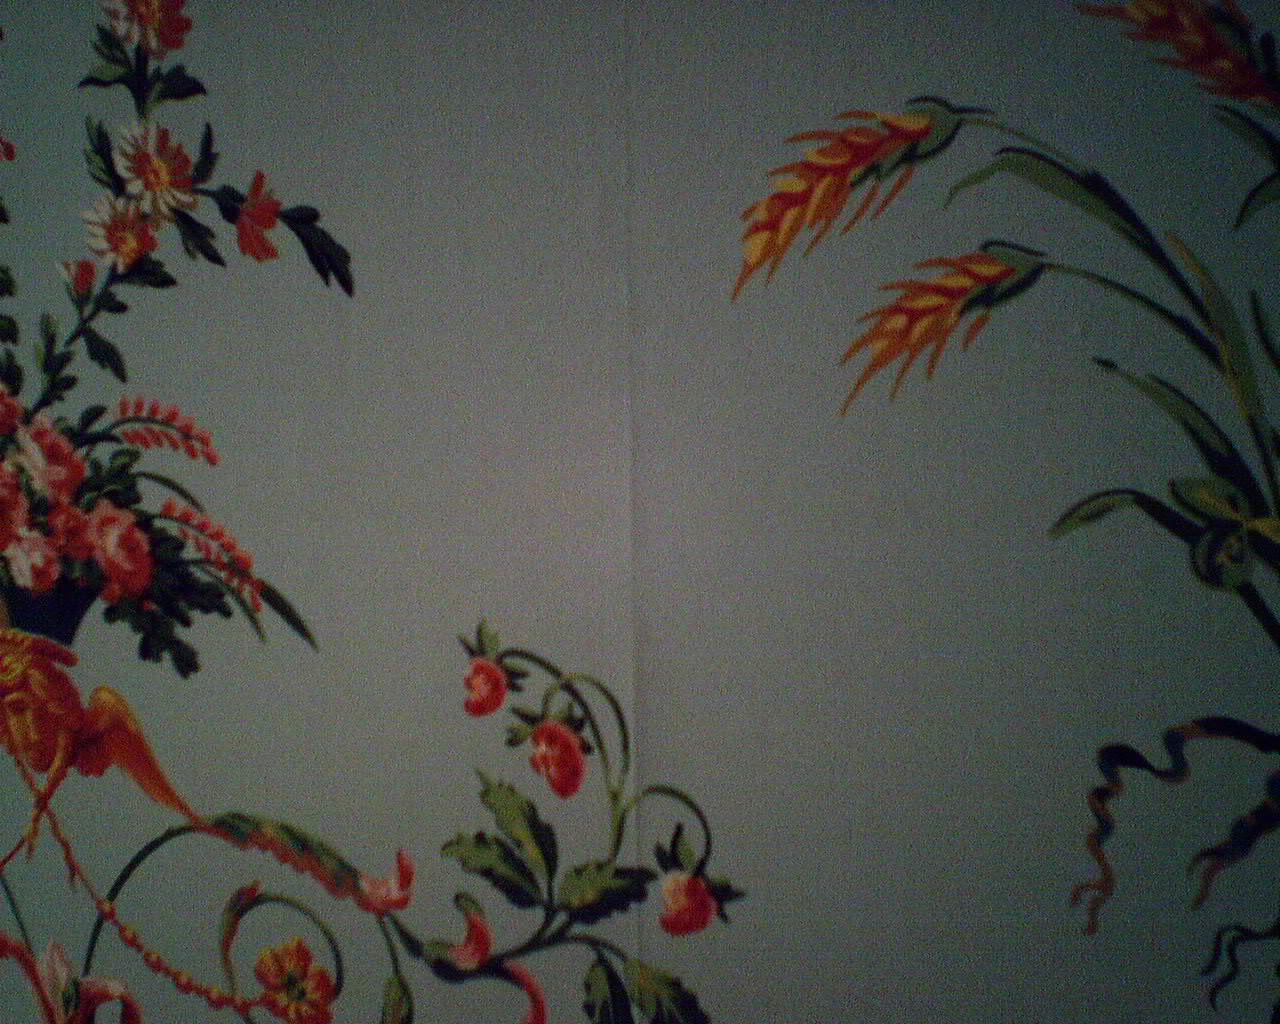 Tags drywall leaky pipe Sheetrock wallpaper 1280x1024